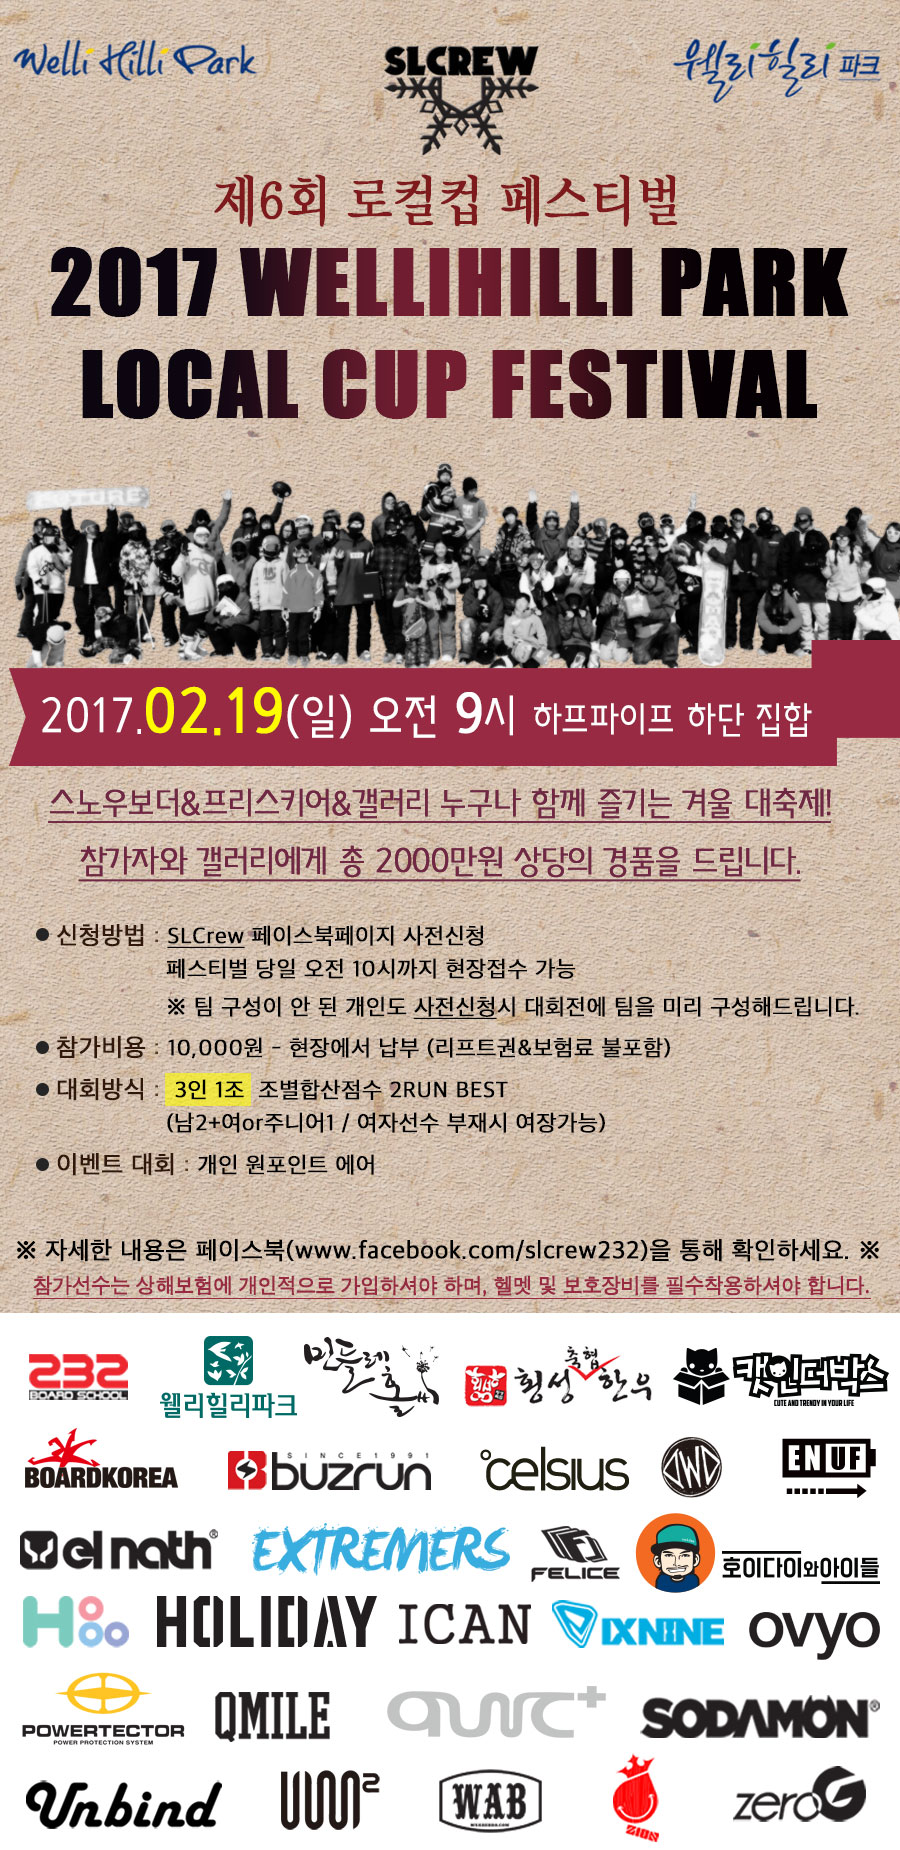 2017-6th로컬컵포스터1.jpg